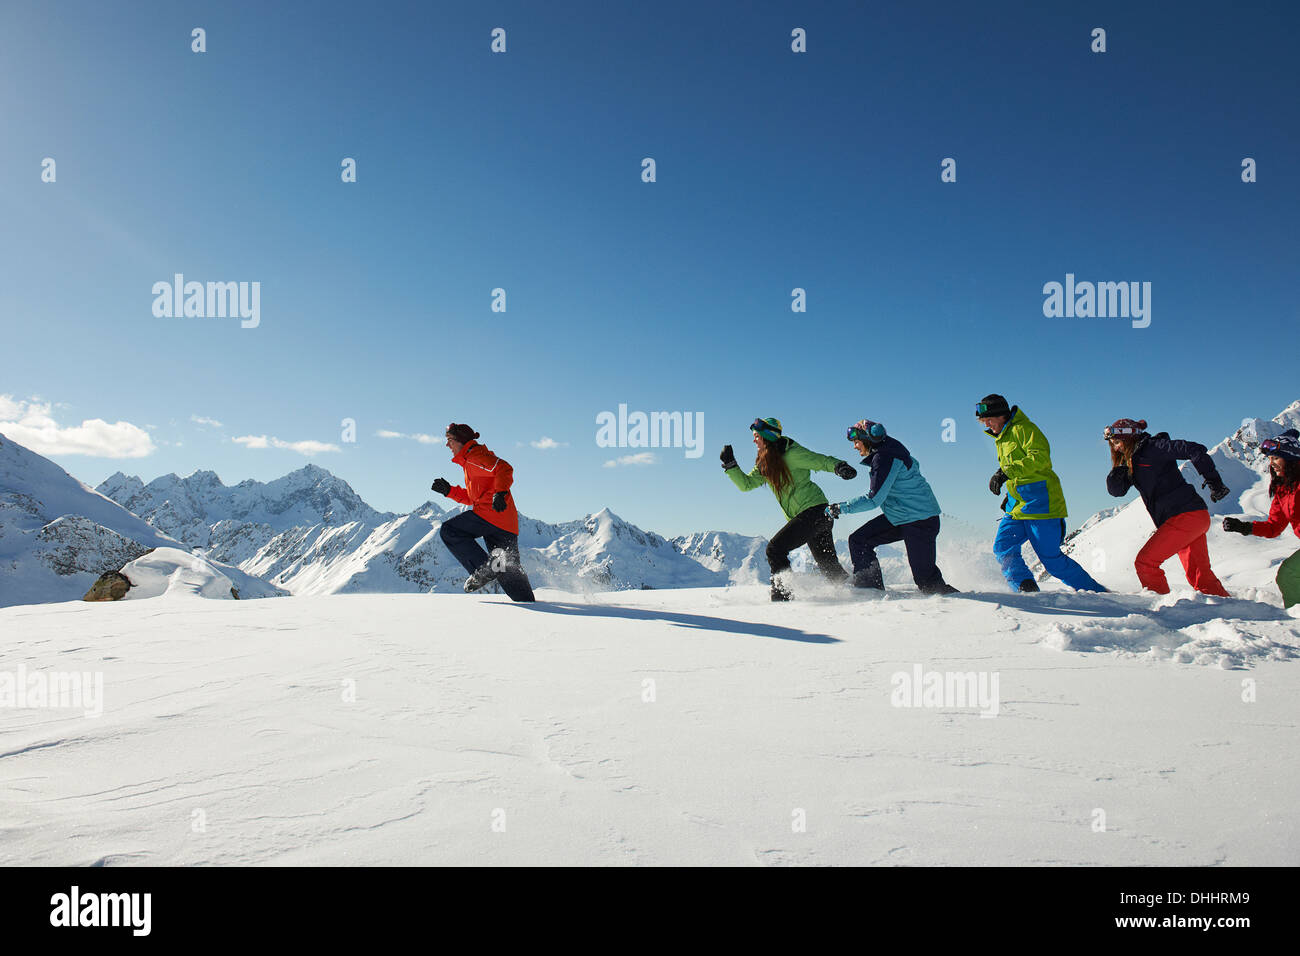 Friends running in snow, Kuhtai, Austria - Stock Image